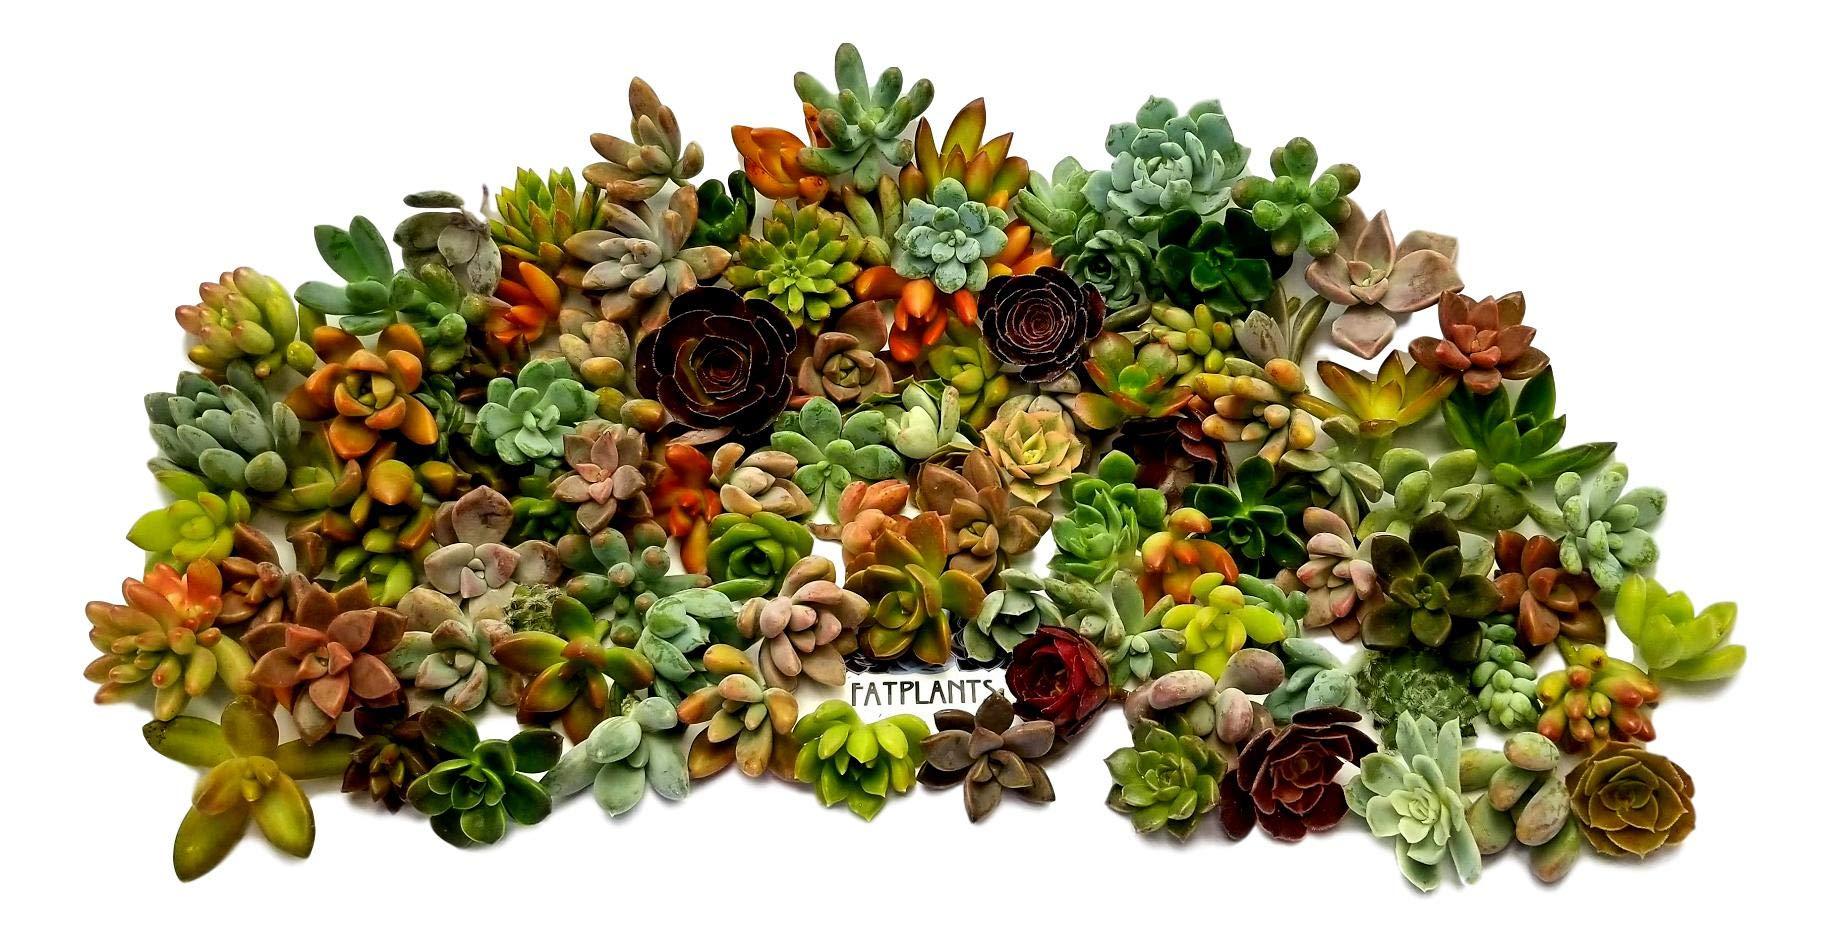 Fat Plants San Diego Miniature Rosette Succulent Cuttings (100) by Fat Plants San Diego (Image #1)